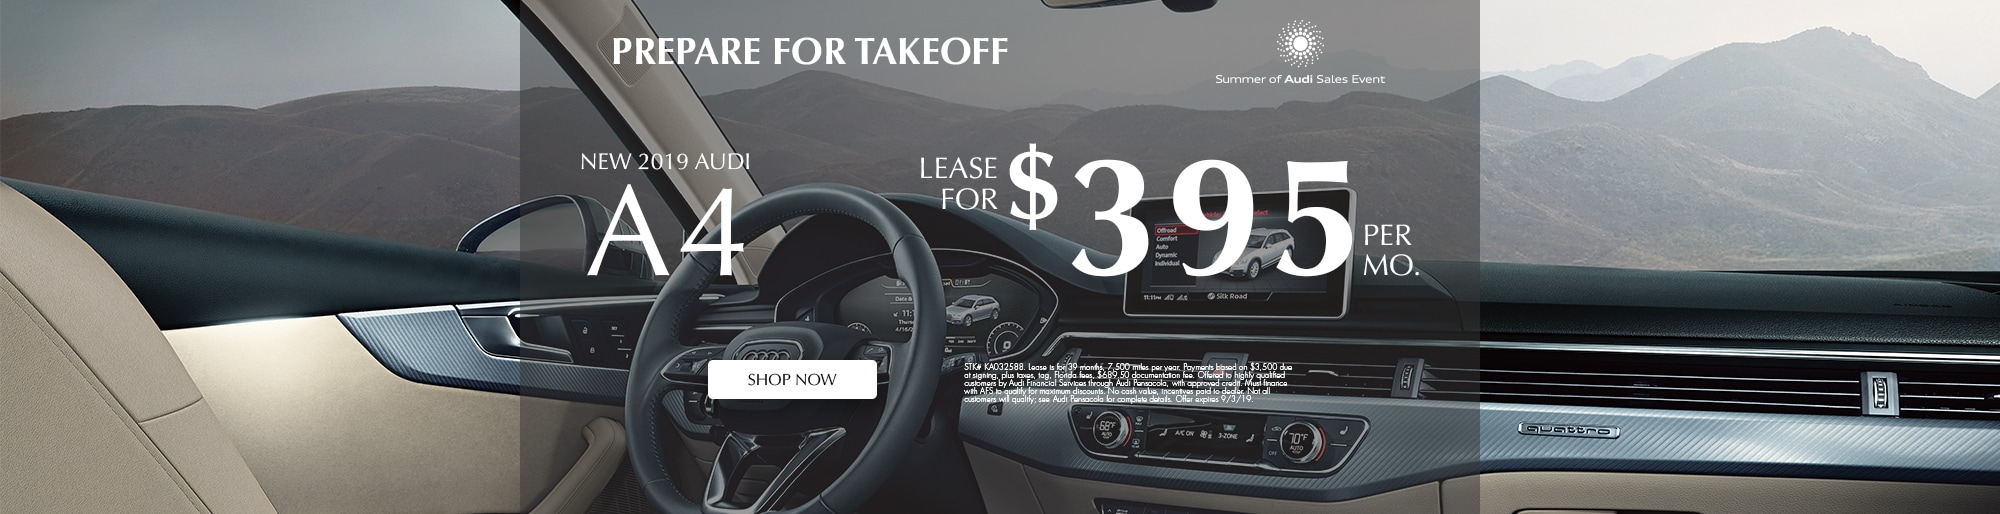 Audi Pensacola: Audi Dealership in Pensacola, FL